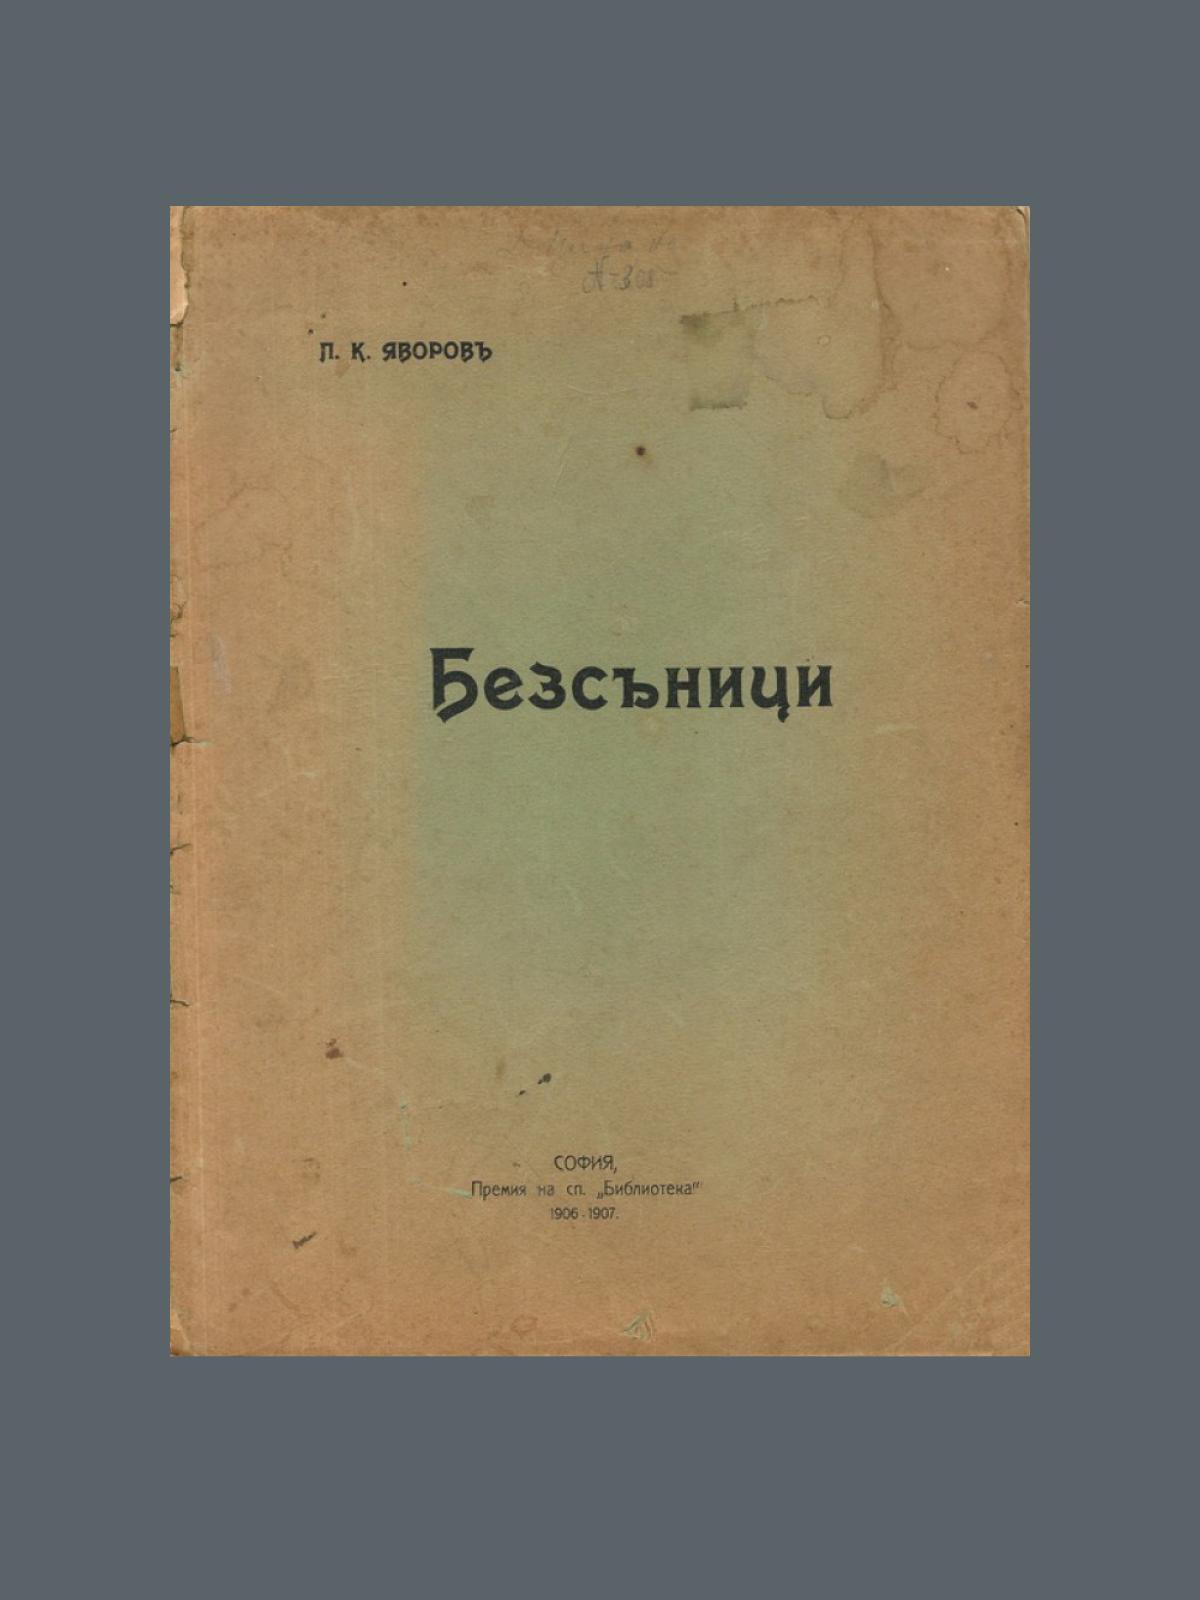 П. К. Яворов. Безсъници (1906-1907)